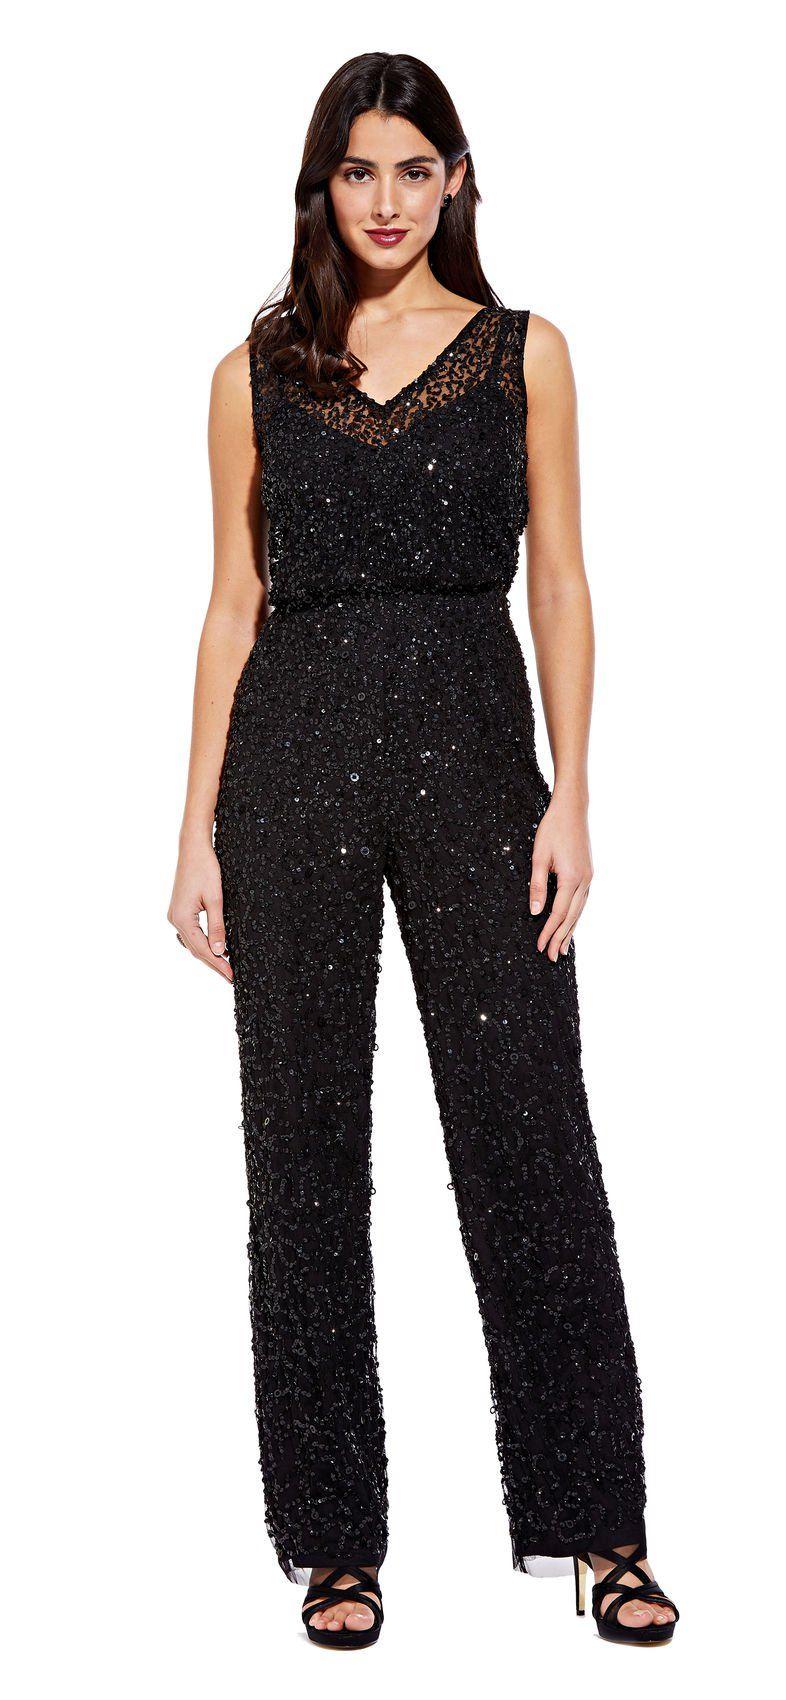 d672d7e8369 Sequin Beaded Jumpsuit with Illusion Neckline